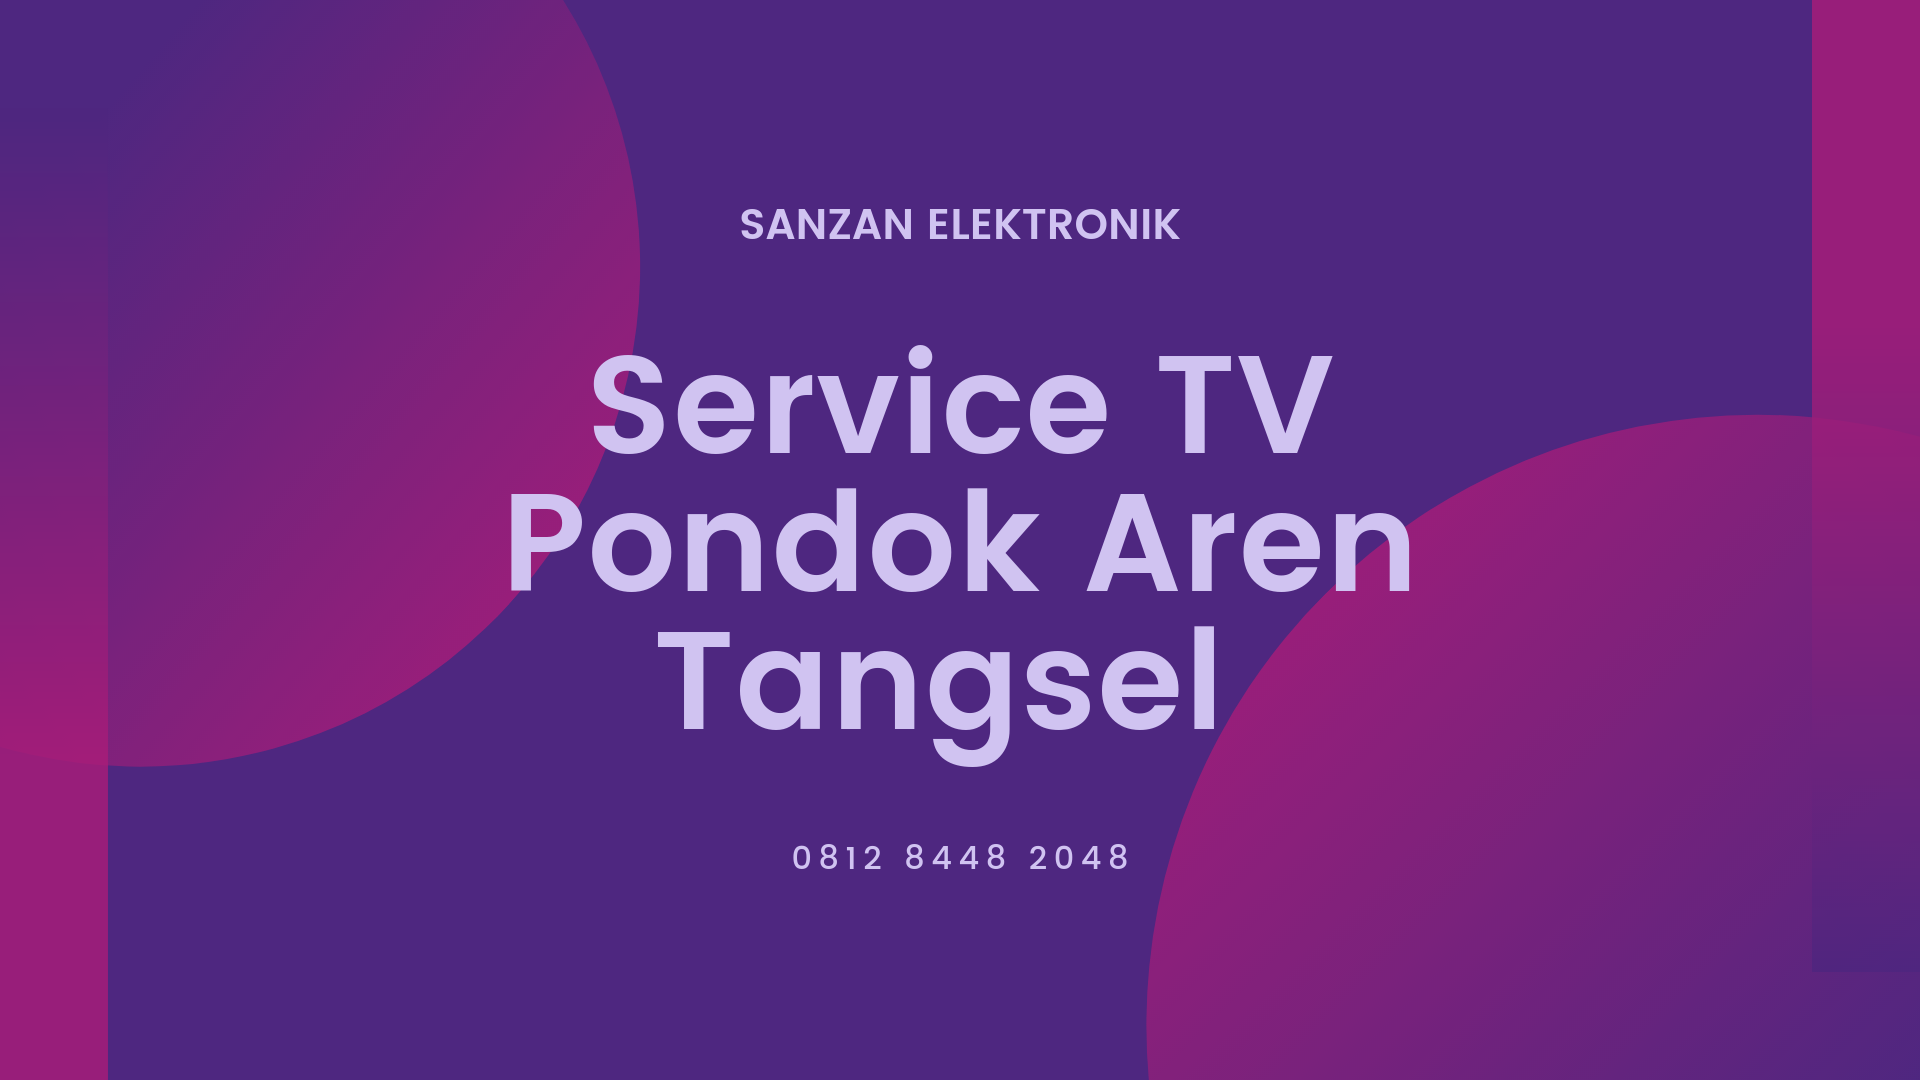 Service TV Pondok Aren Tangsel